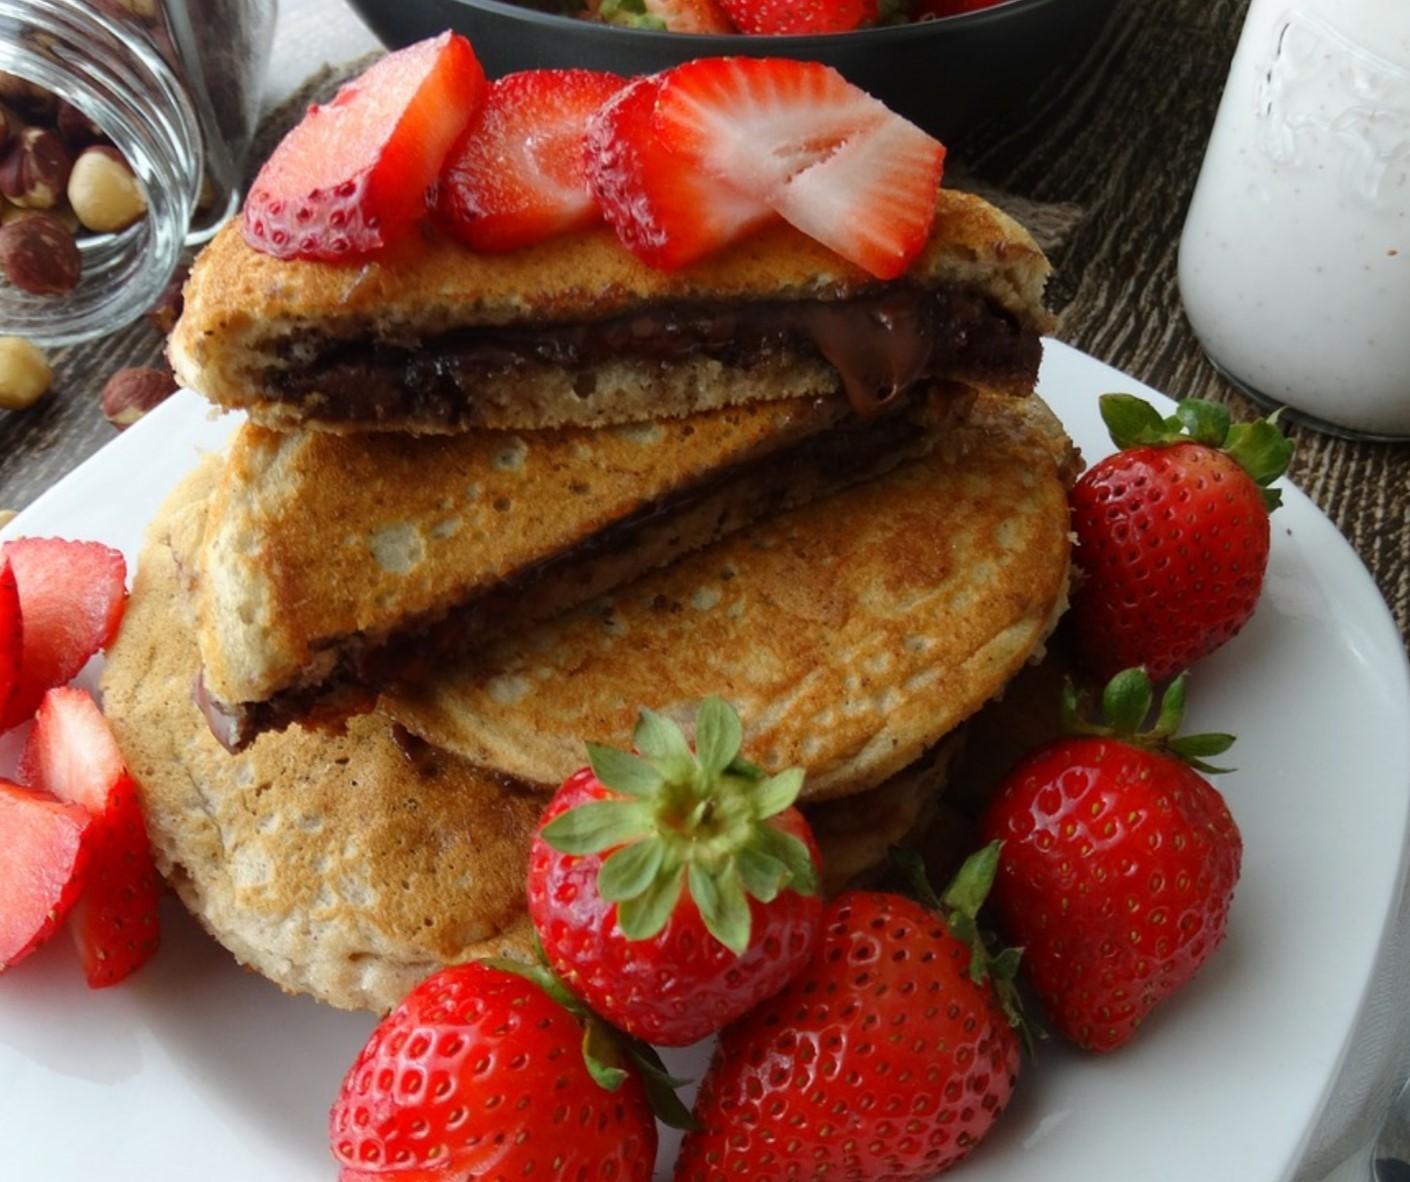 Heiratsantrag beim Frühstück